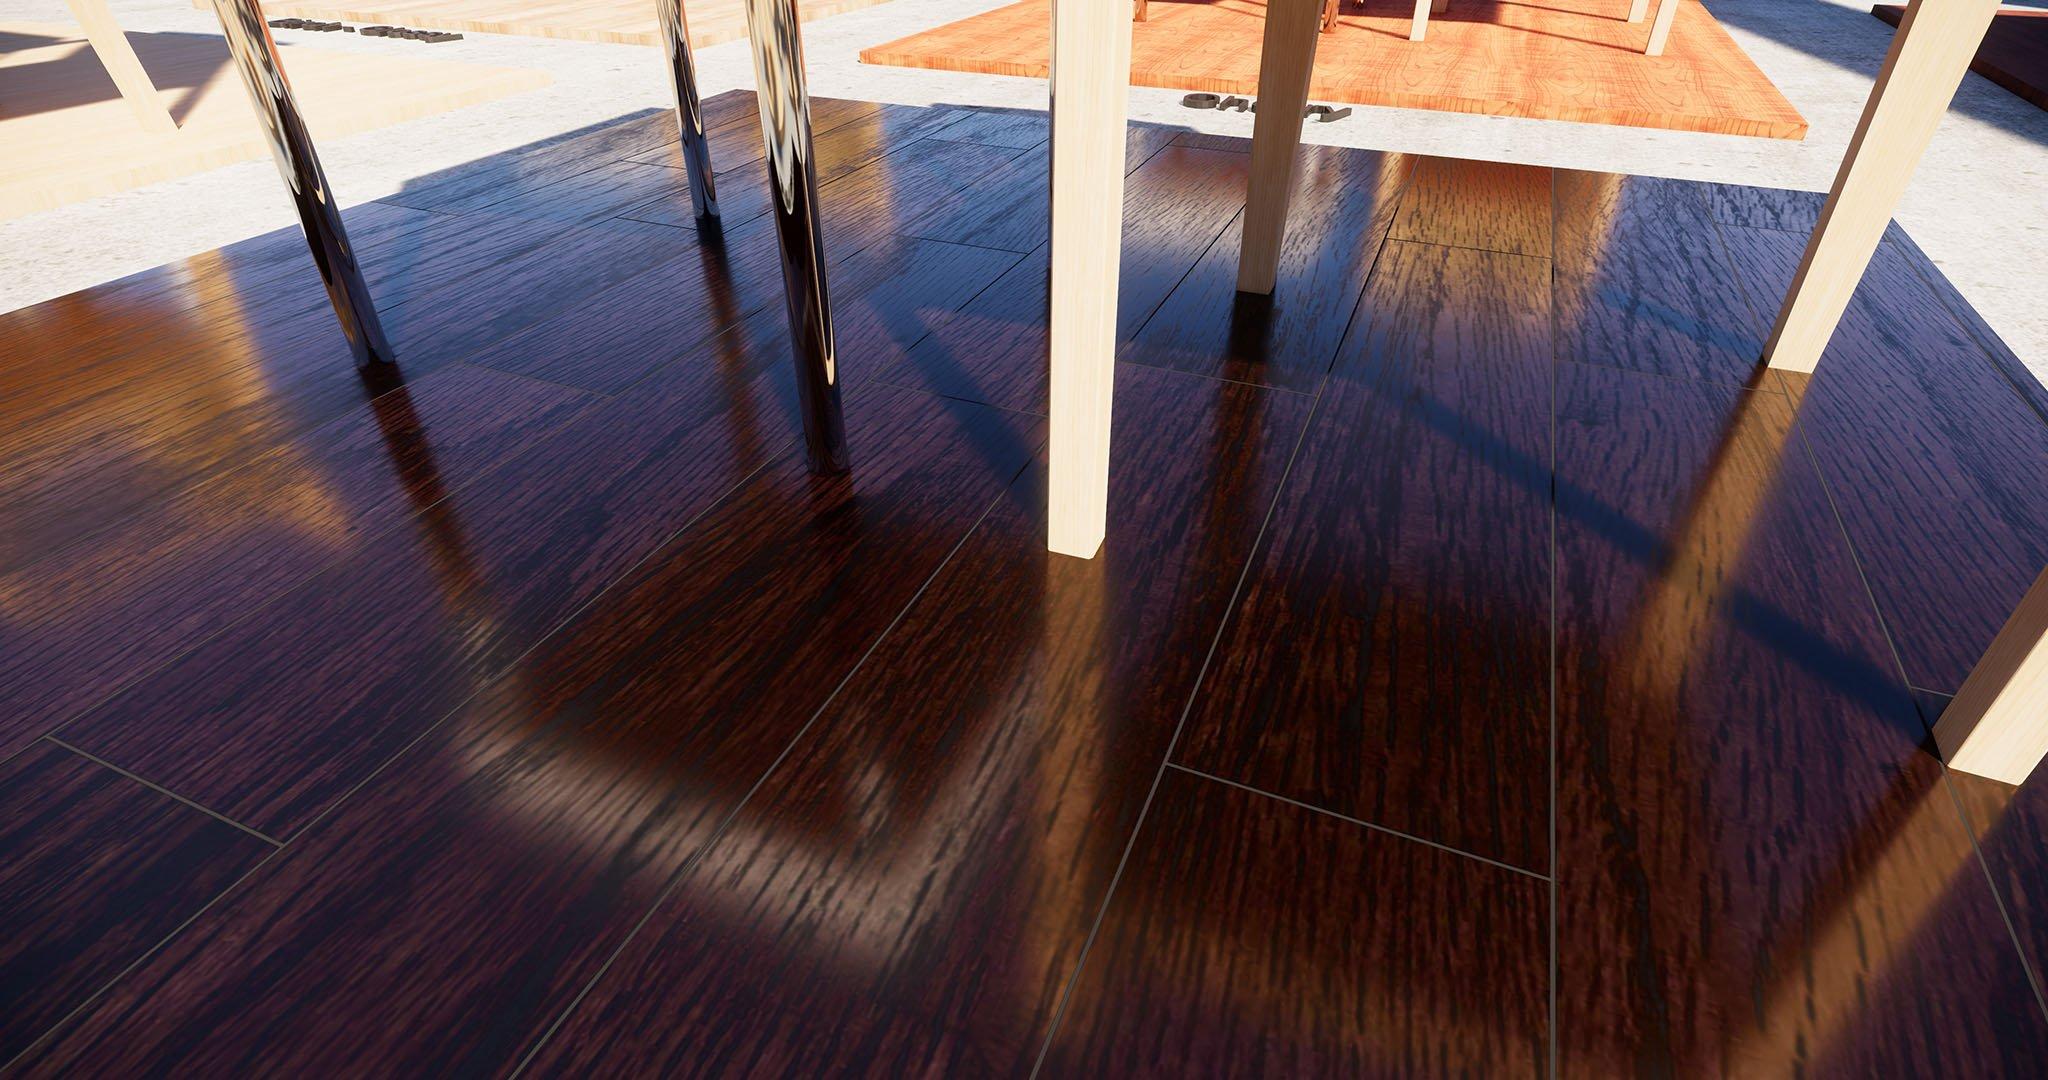 3b_detailed-wood-planks